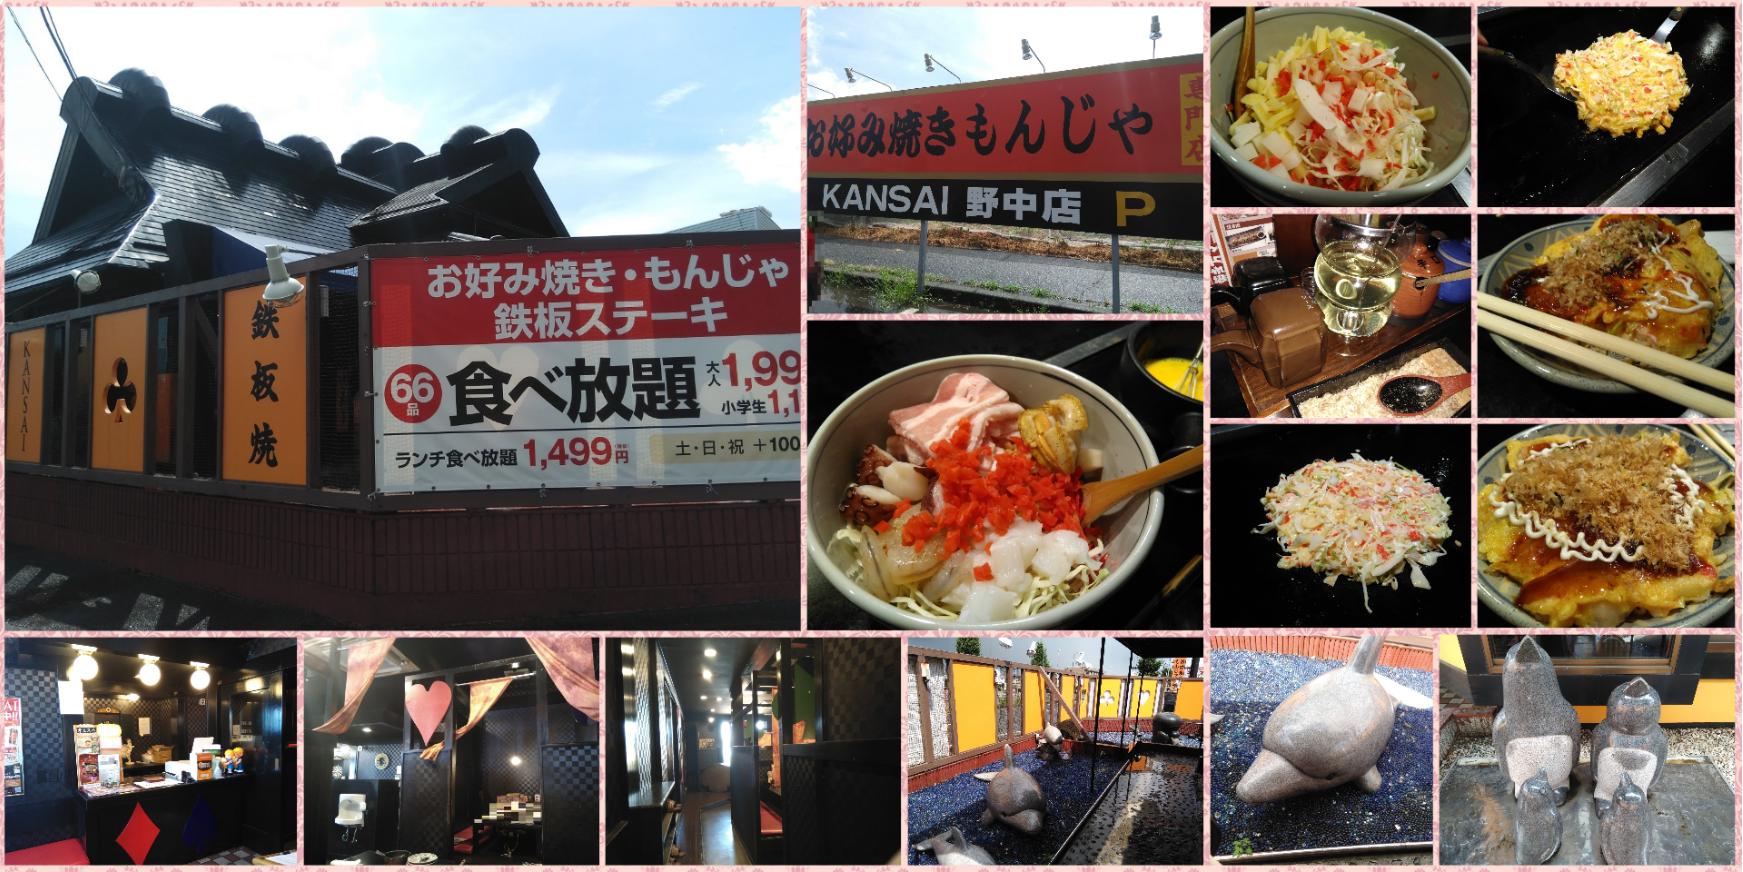 KANSAI前橋野中店(群馬県前橋市)